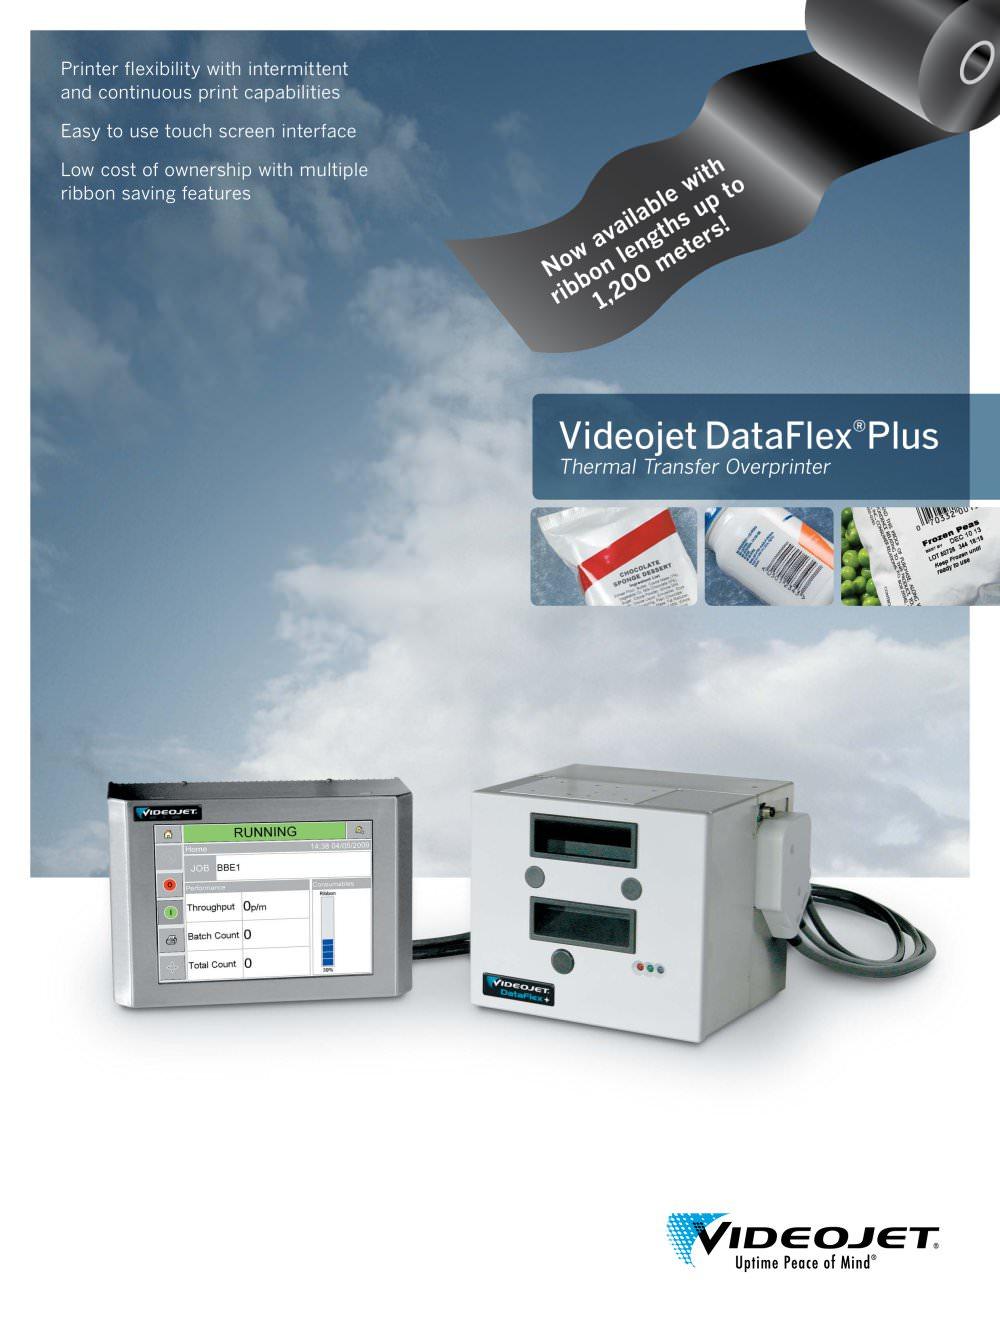 Videojet Dataflex Plus Datasheet - 1 / 4 Pages